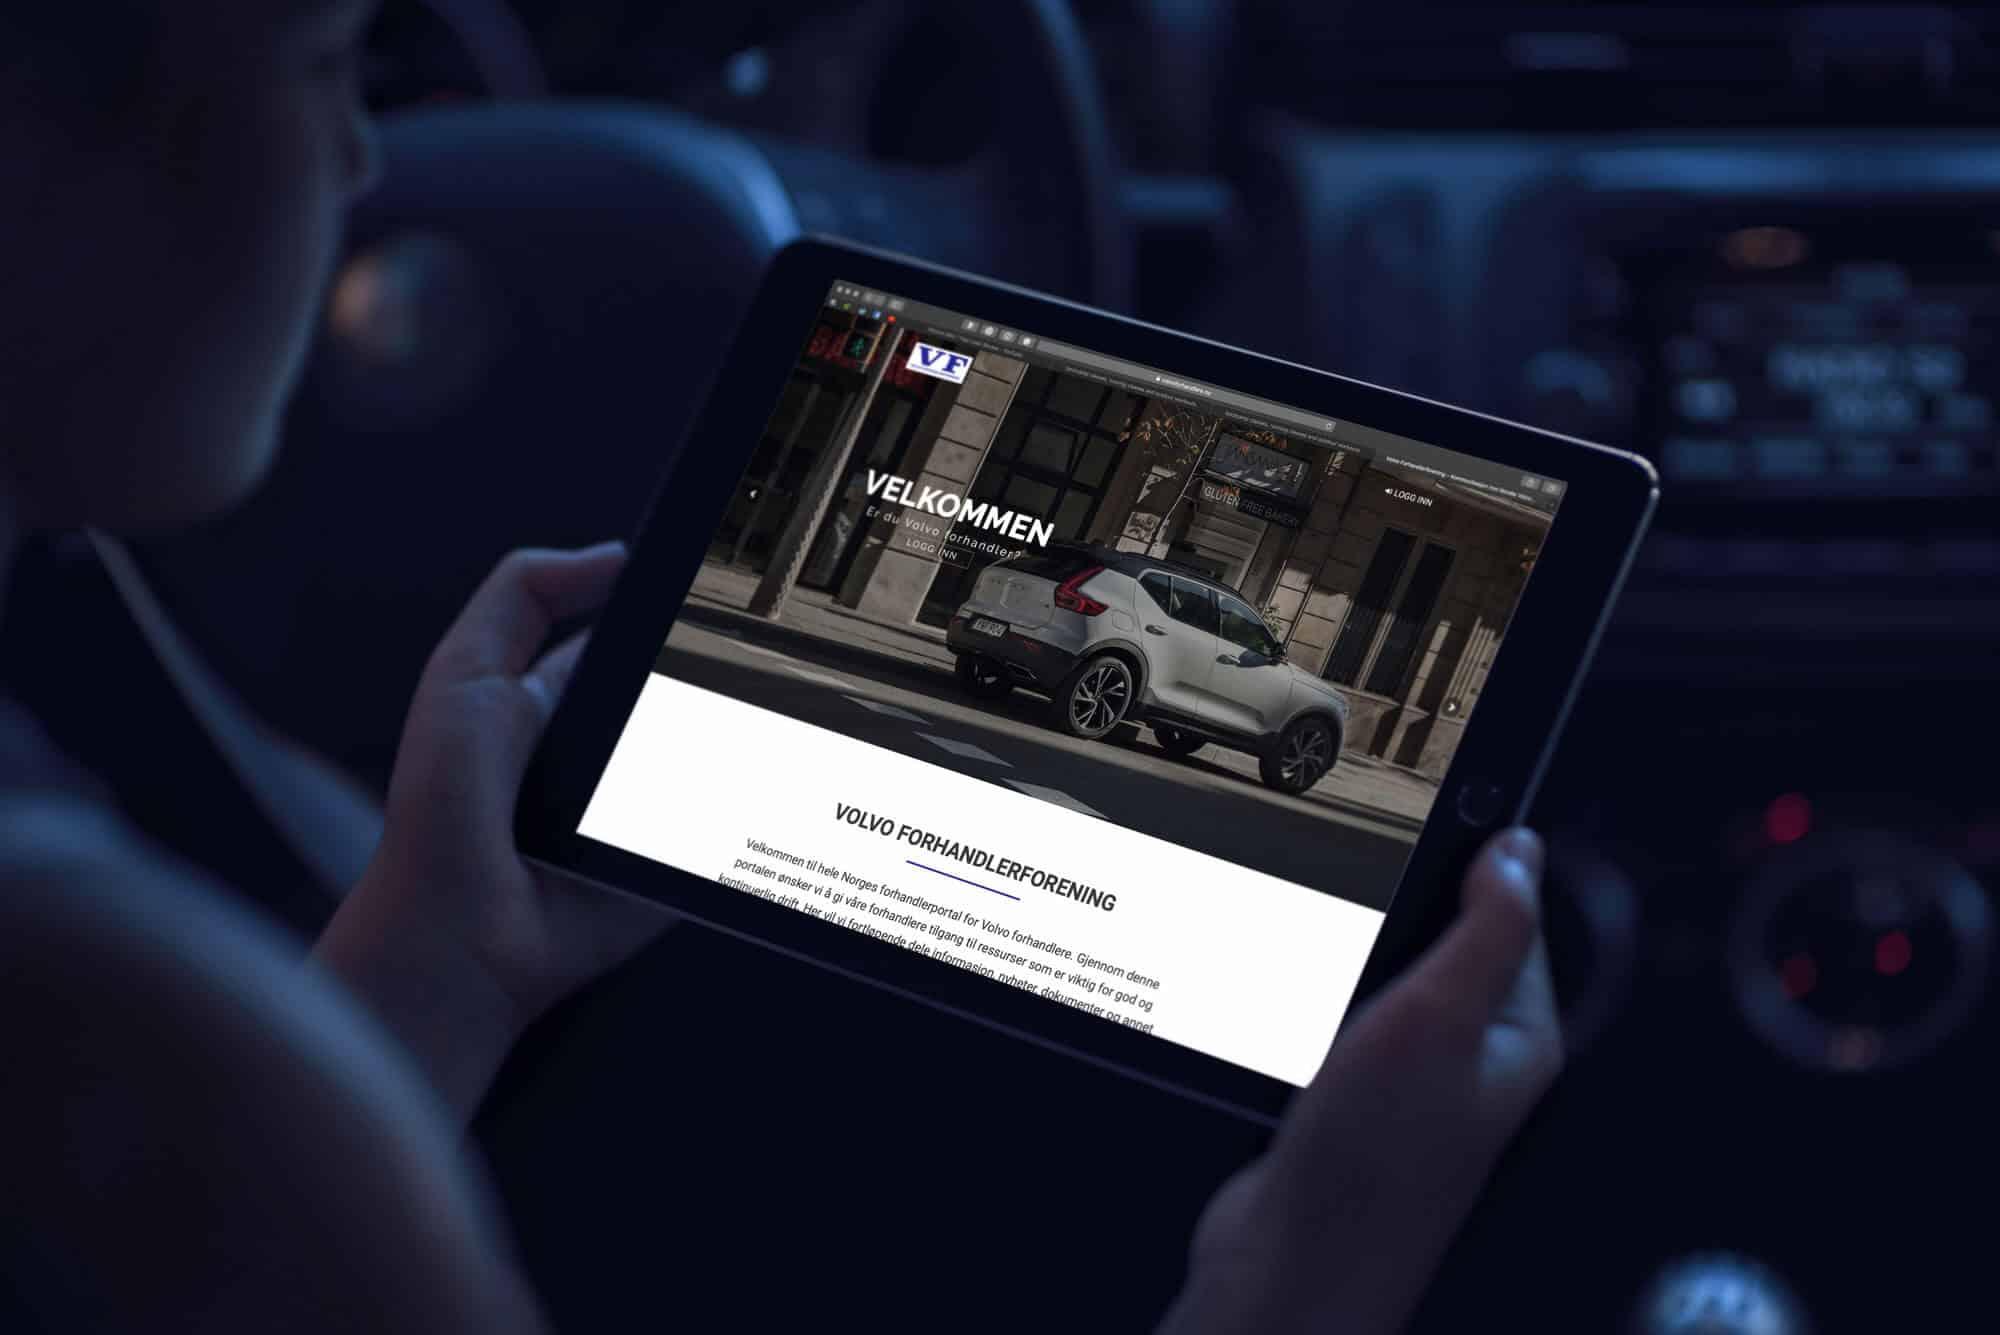 Volvo forhandlerforening